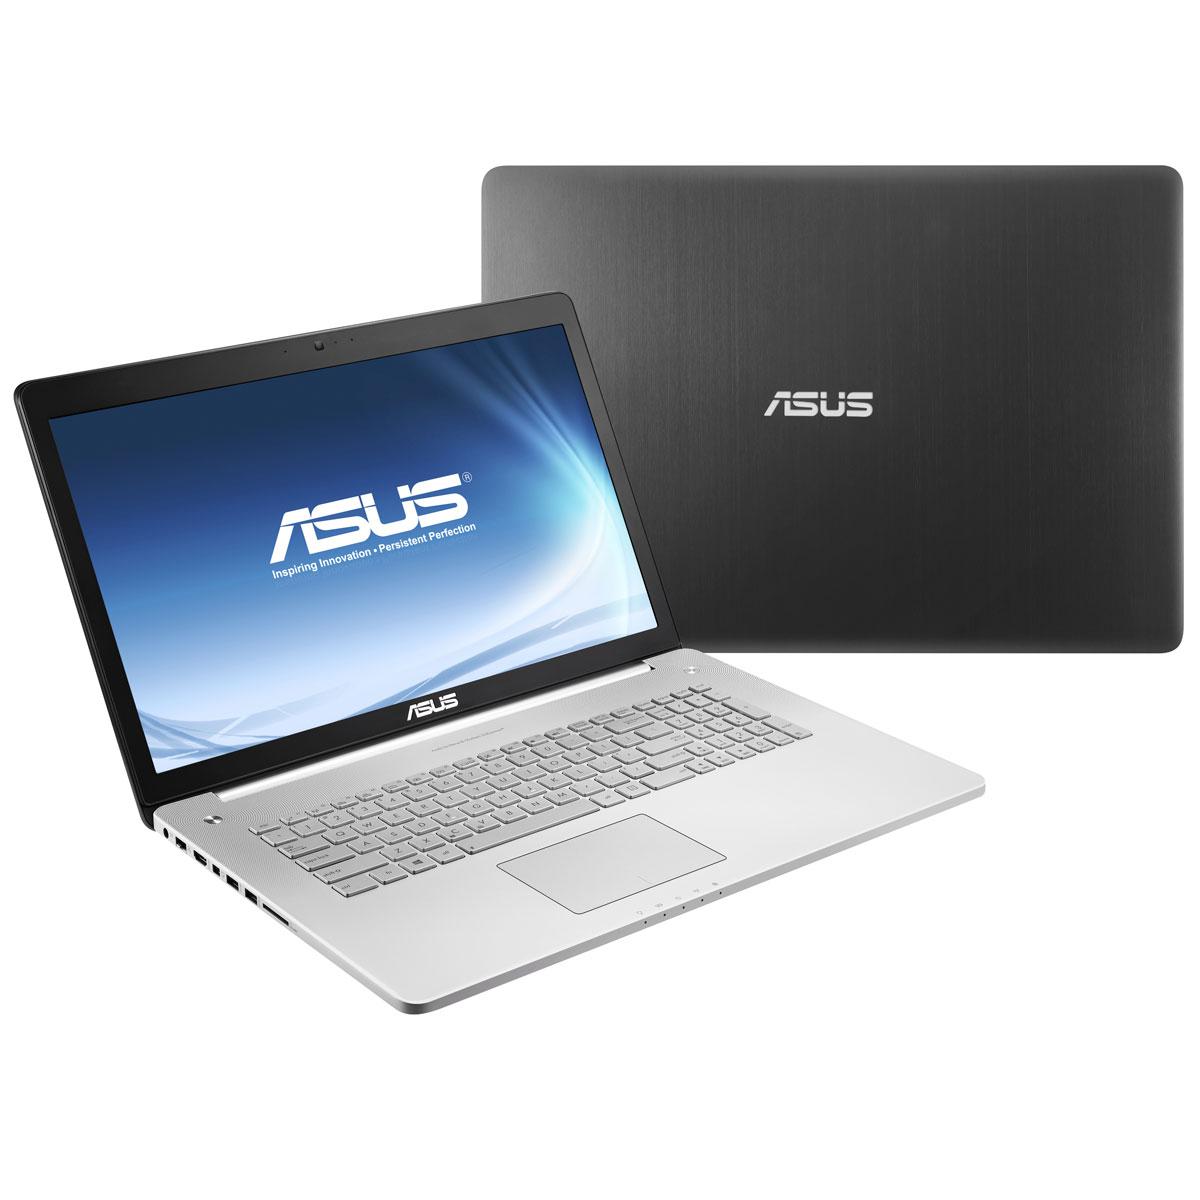 "PC portable ASUS N750JV-T4222H Intel Core i7-4700HQ 16 Go SSD 256 Go + HDD 1.5 To 17.3"" LED NVIDIA GeForce GT 750M Graveur Blu-ray/DVD Wi-Fi N/Bluetooth Webcam Windows 8 64 bits (garantie constructeur 1 an)"